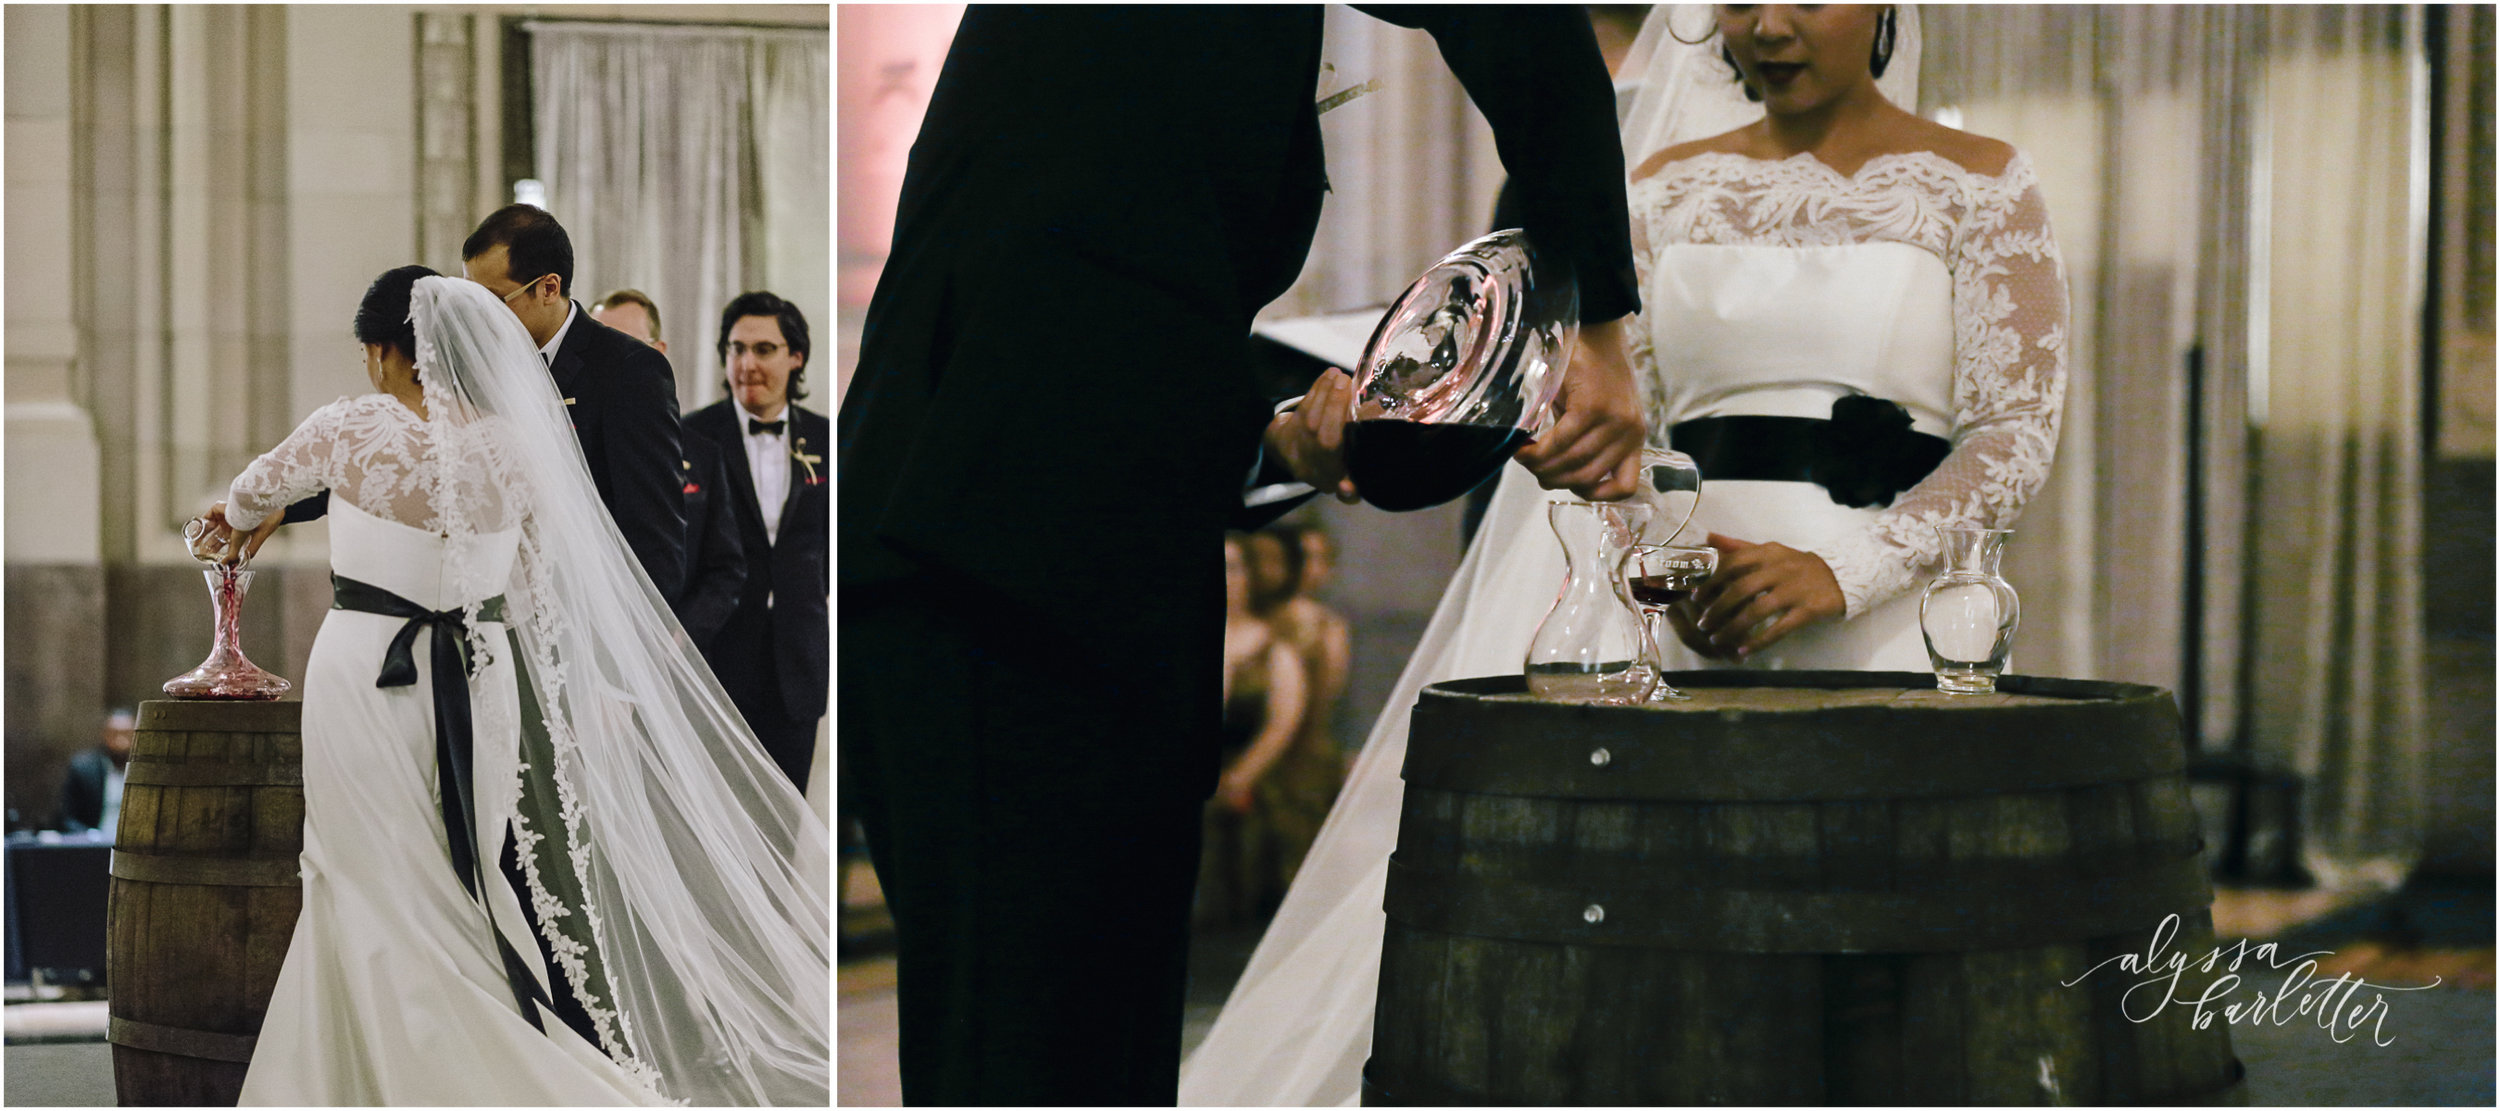 alyssa barletter photography union station wedding photos leopard print winter wedding-1-43.jpg